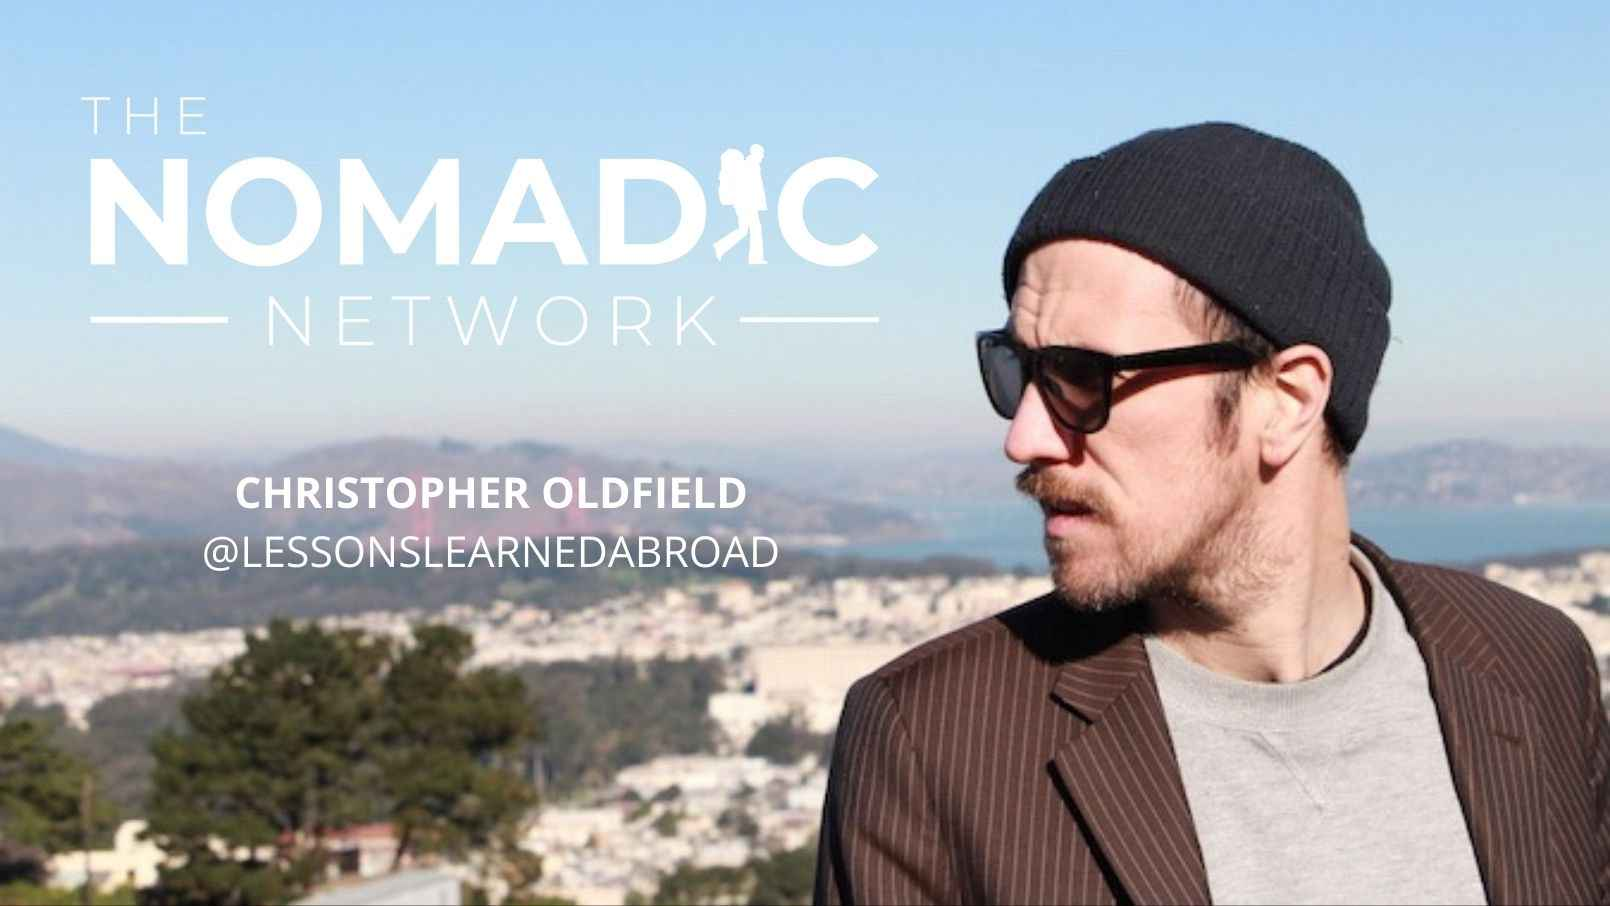 Chris Oldfield in San Francisco